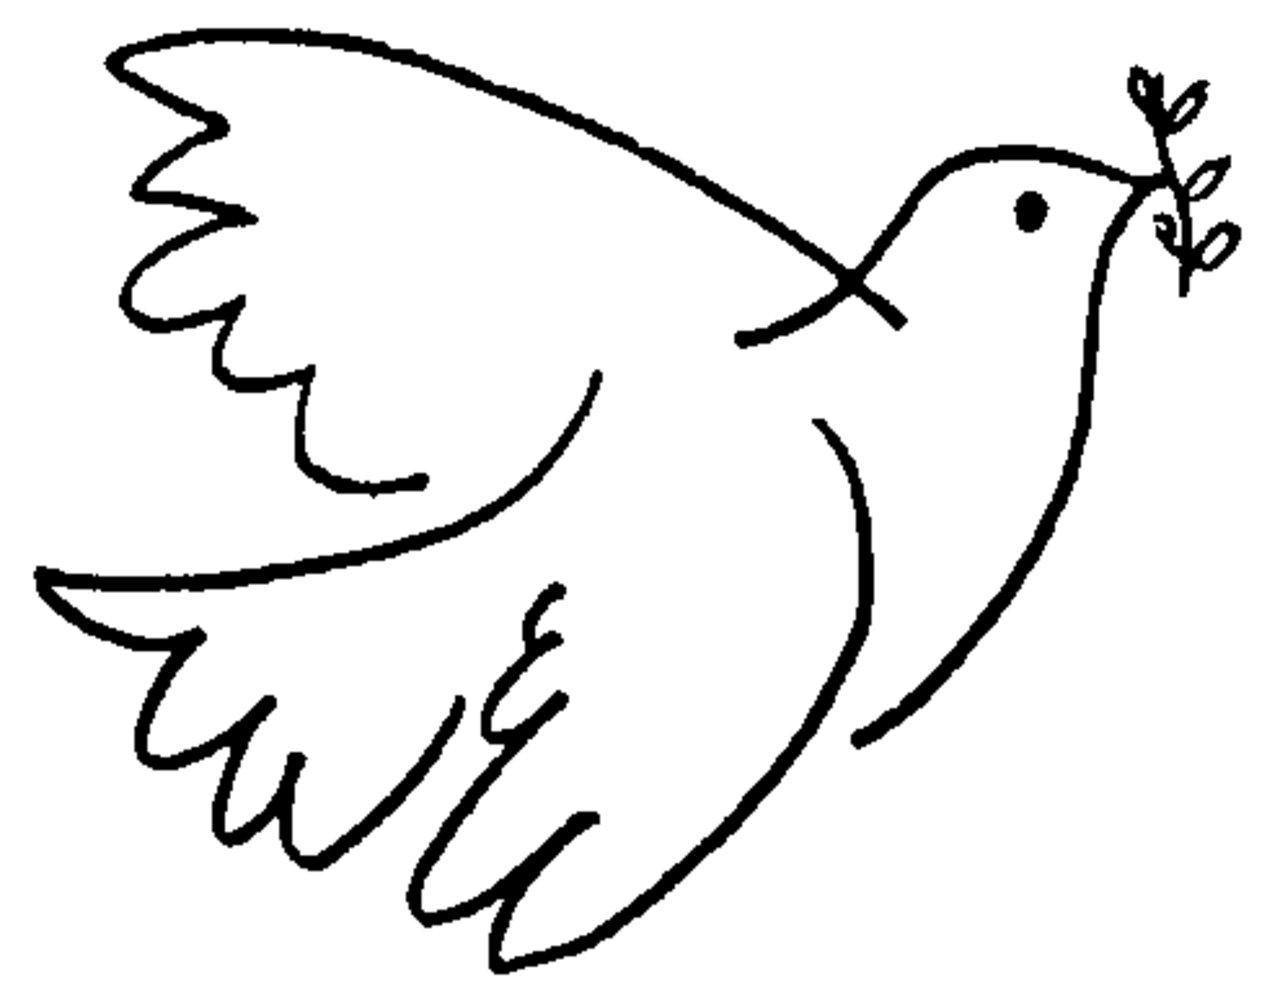 Símbolo de la paz. Foto: sabestusderechos.blogspot.com